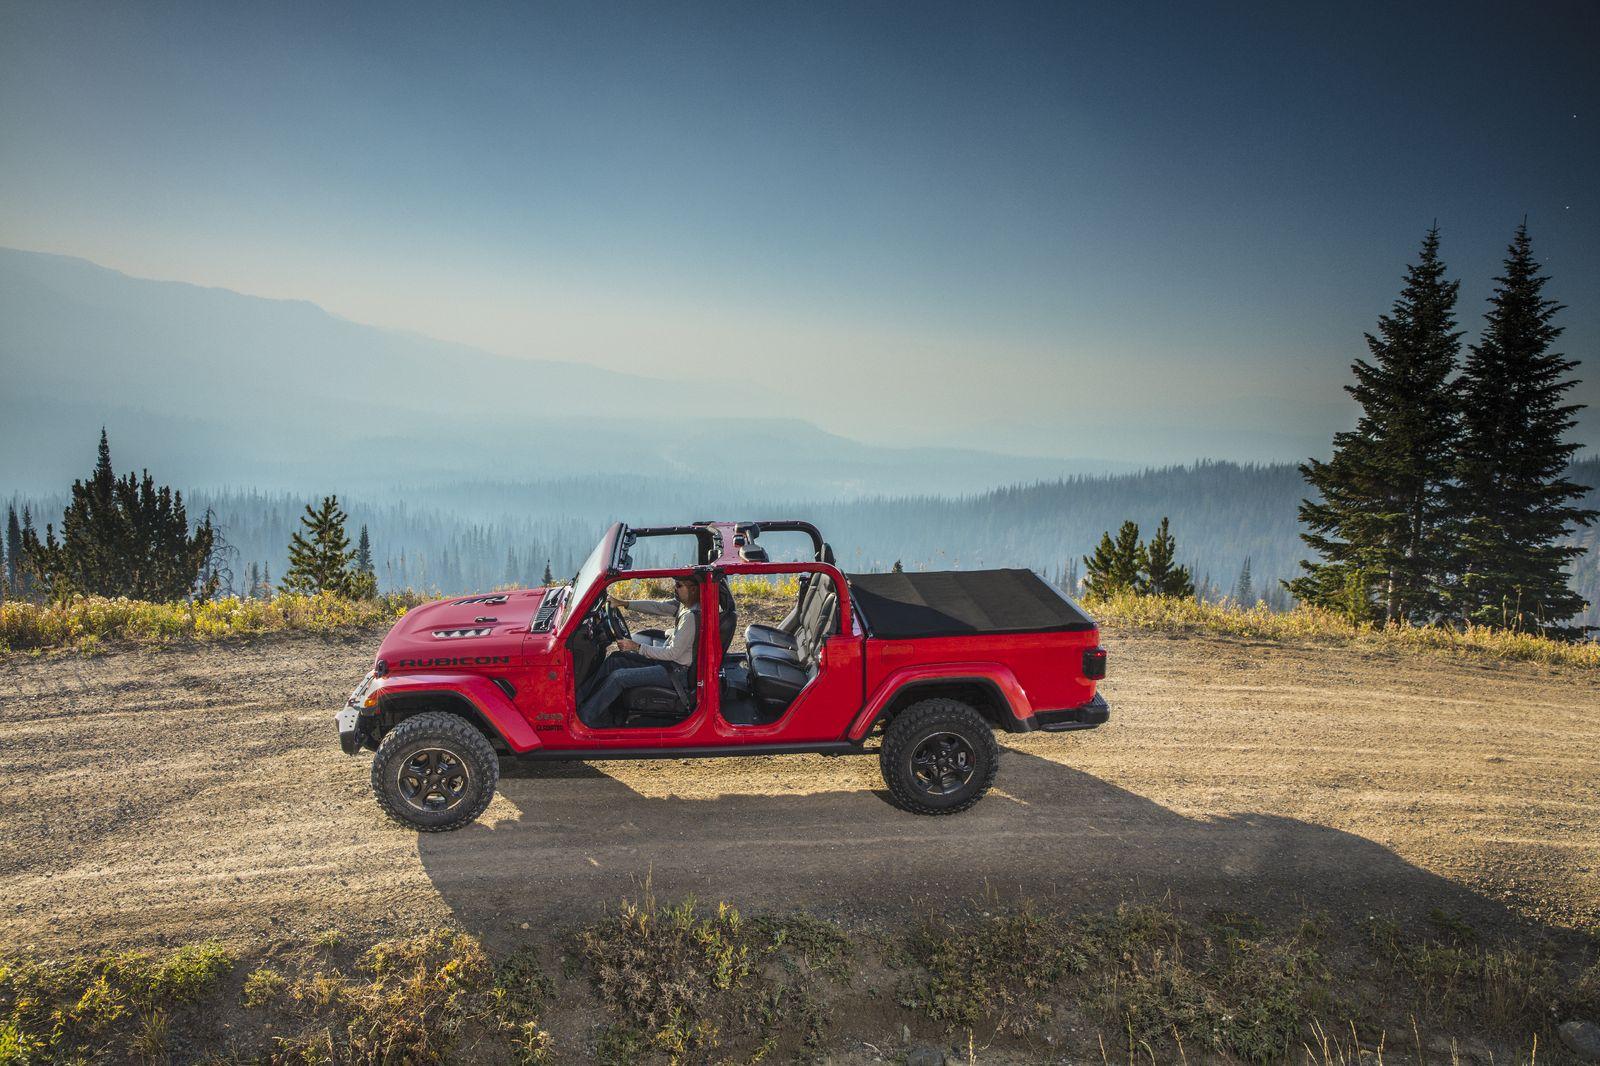 Los Angeles 2018 : Jeep Gladiator - Blog Automobile